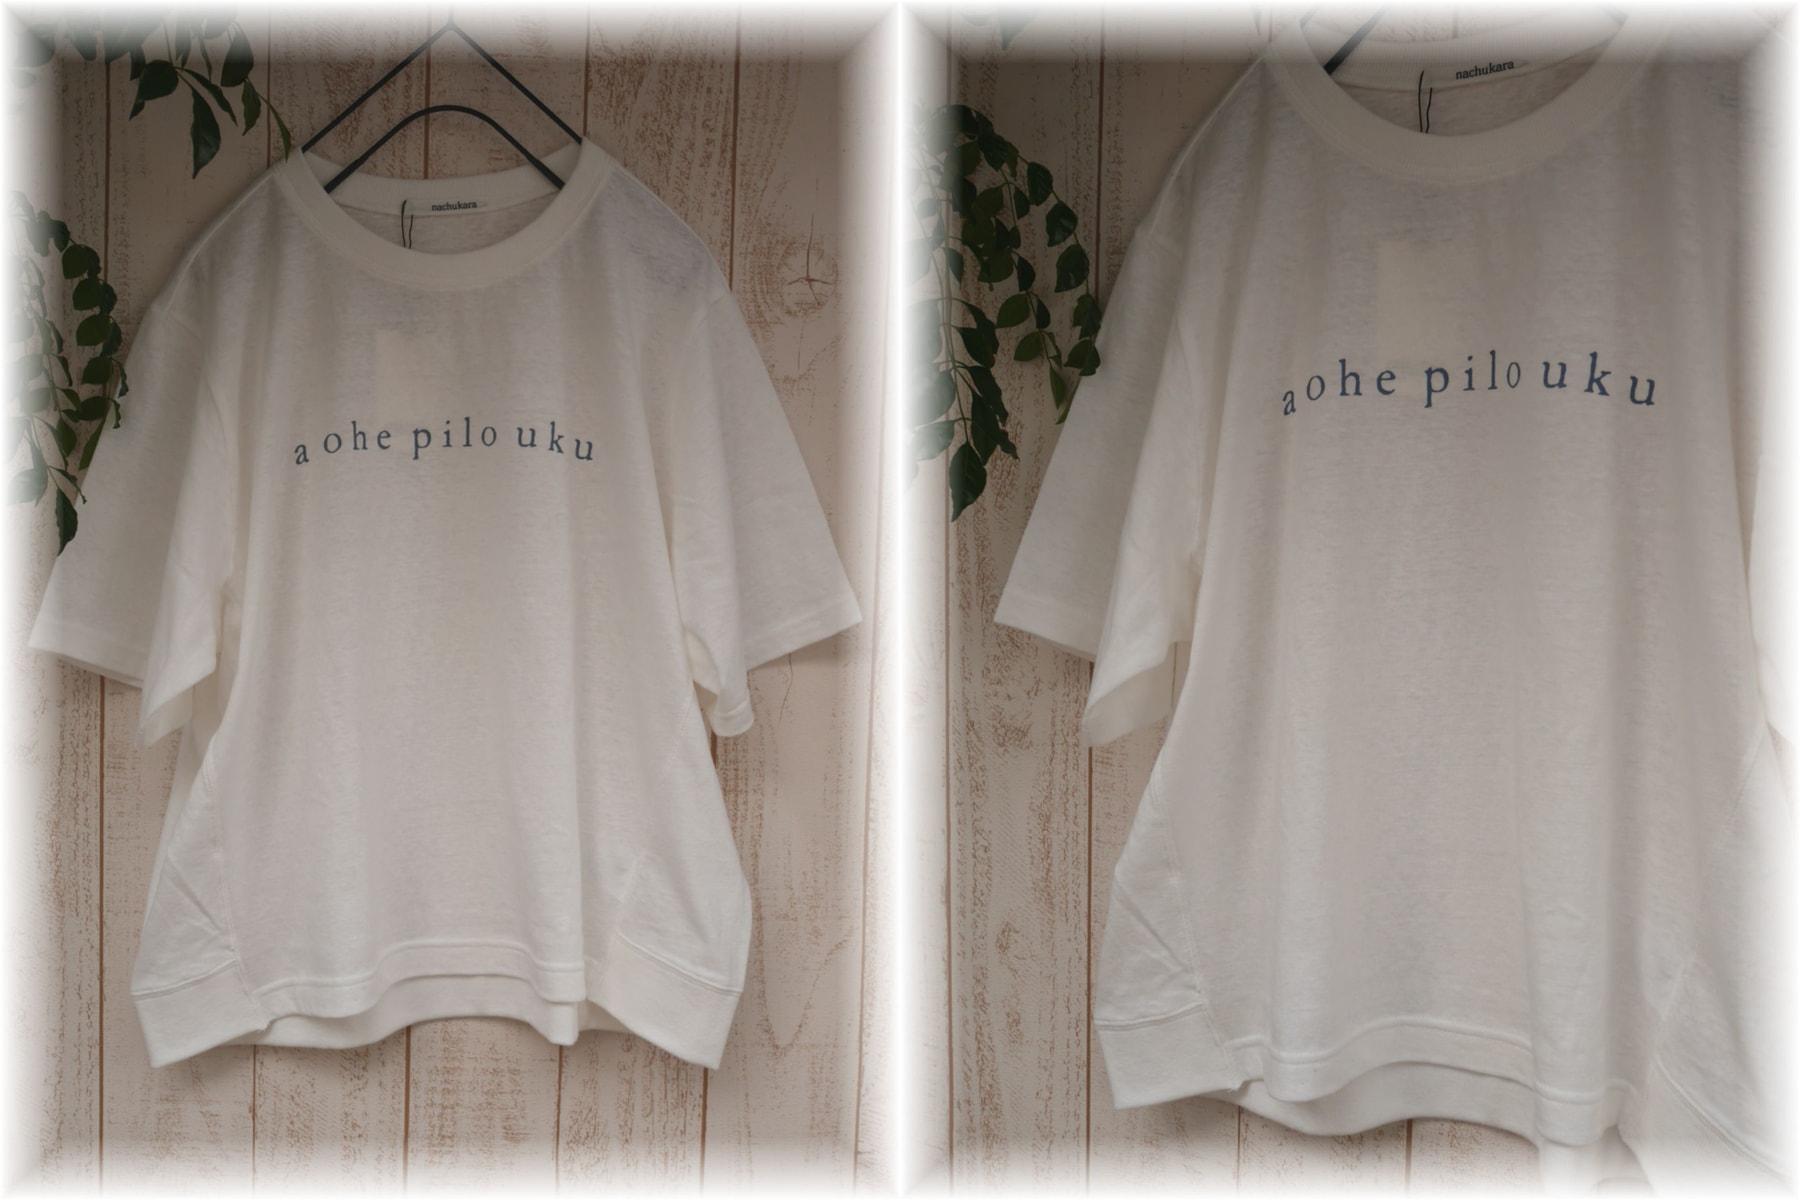 nachukara</span></br>コットンプリントTシャツ<font color=#ff0000>SOLD OUT</font>